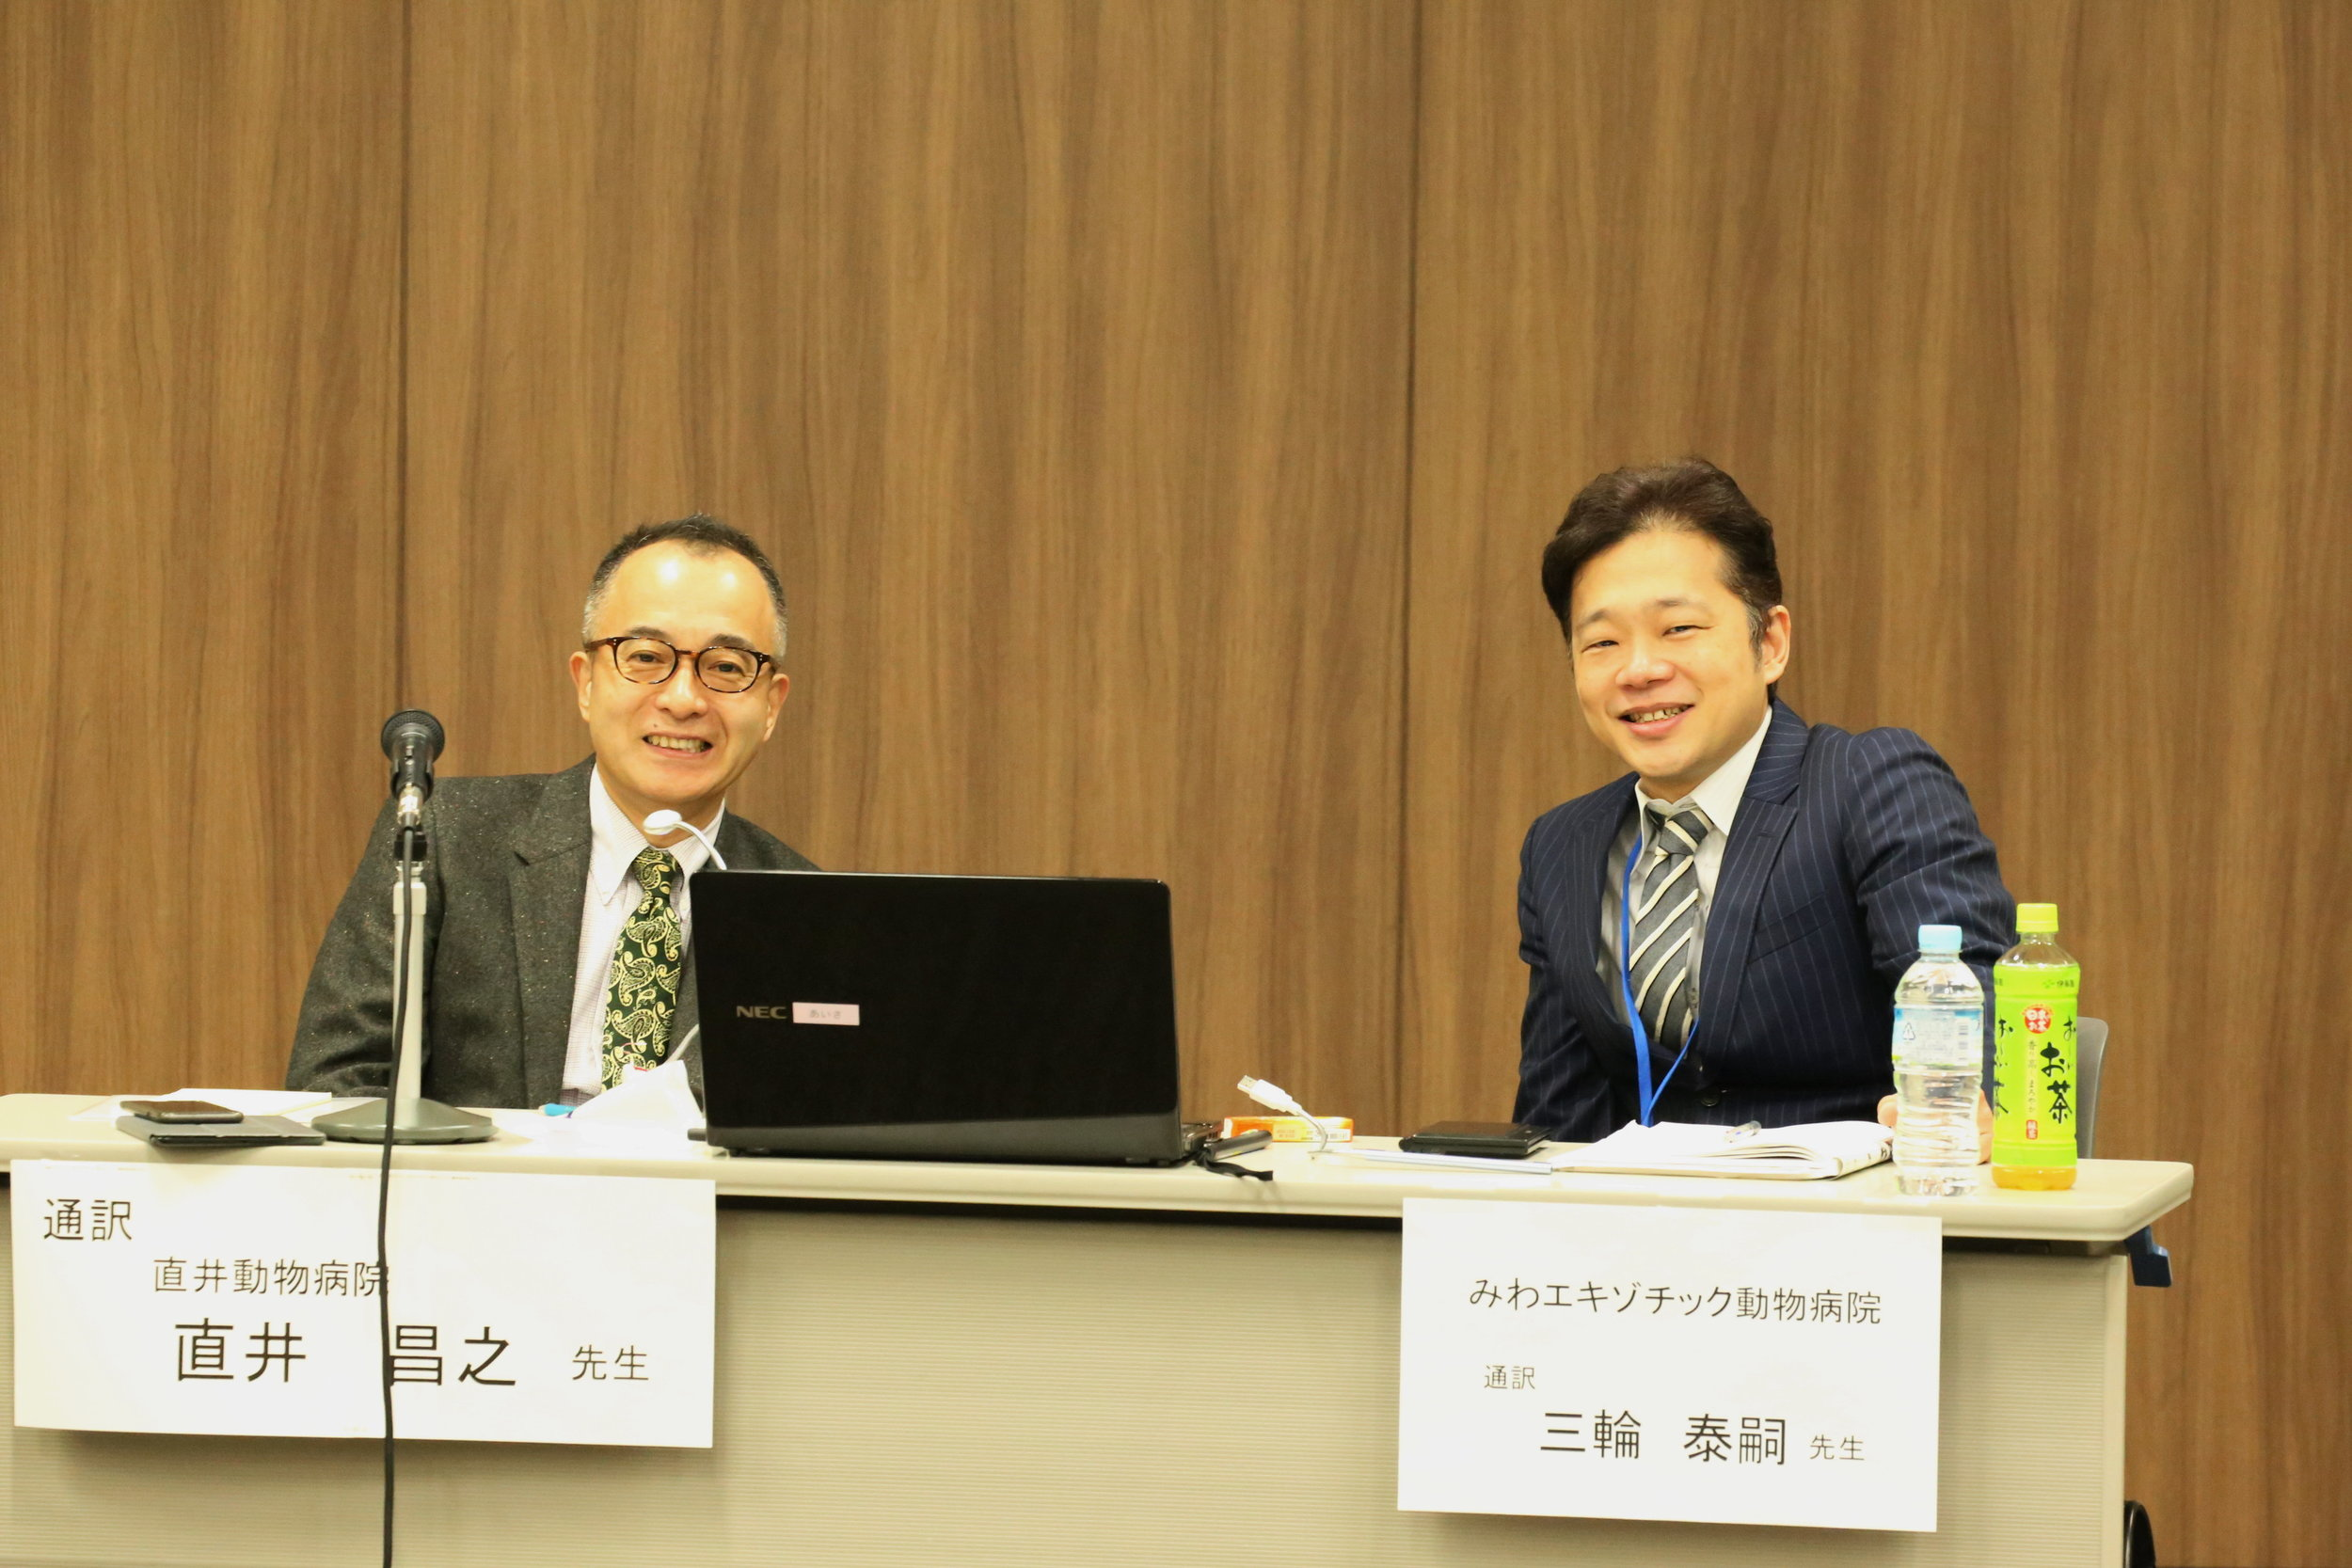 Translator and Miwa